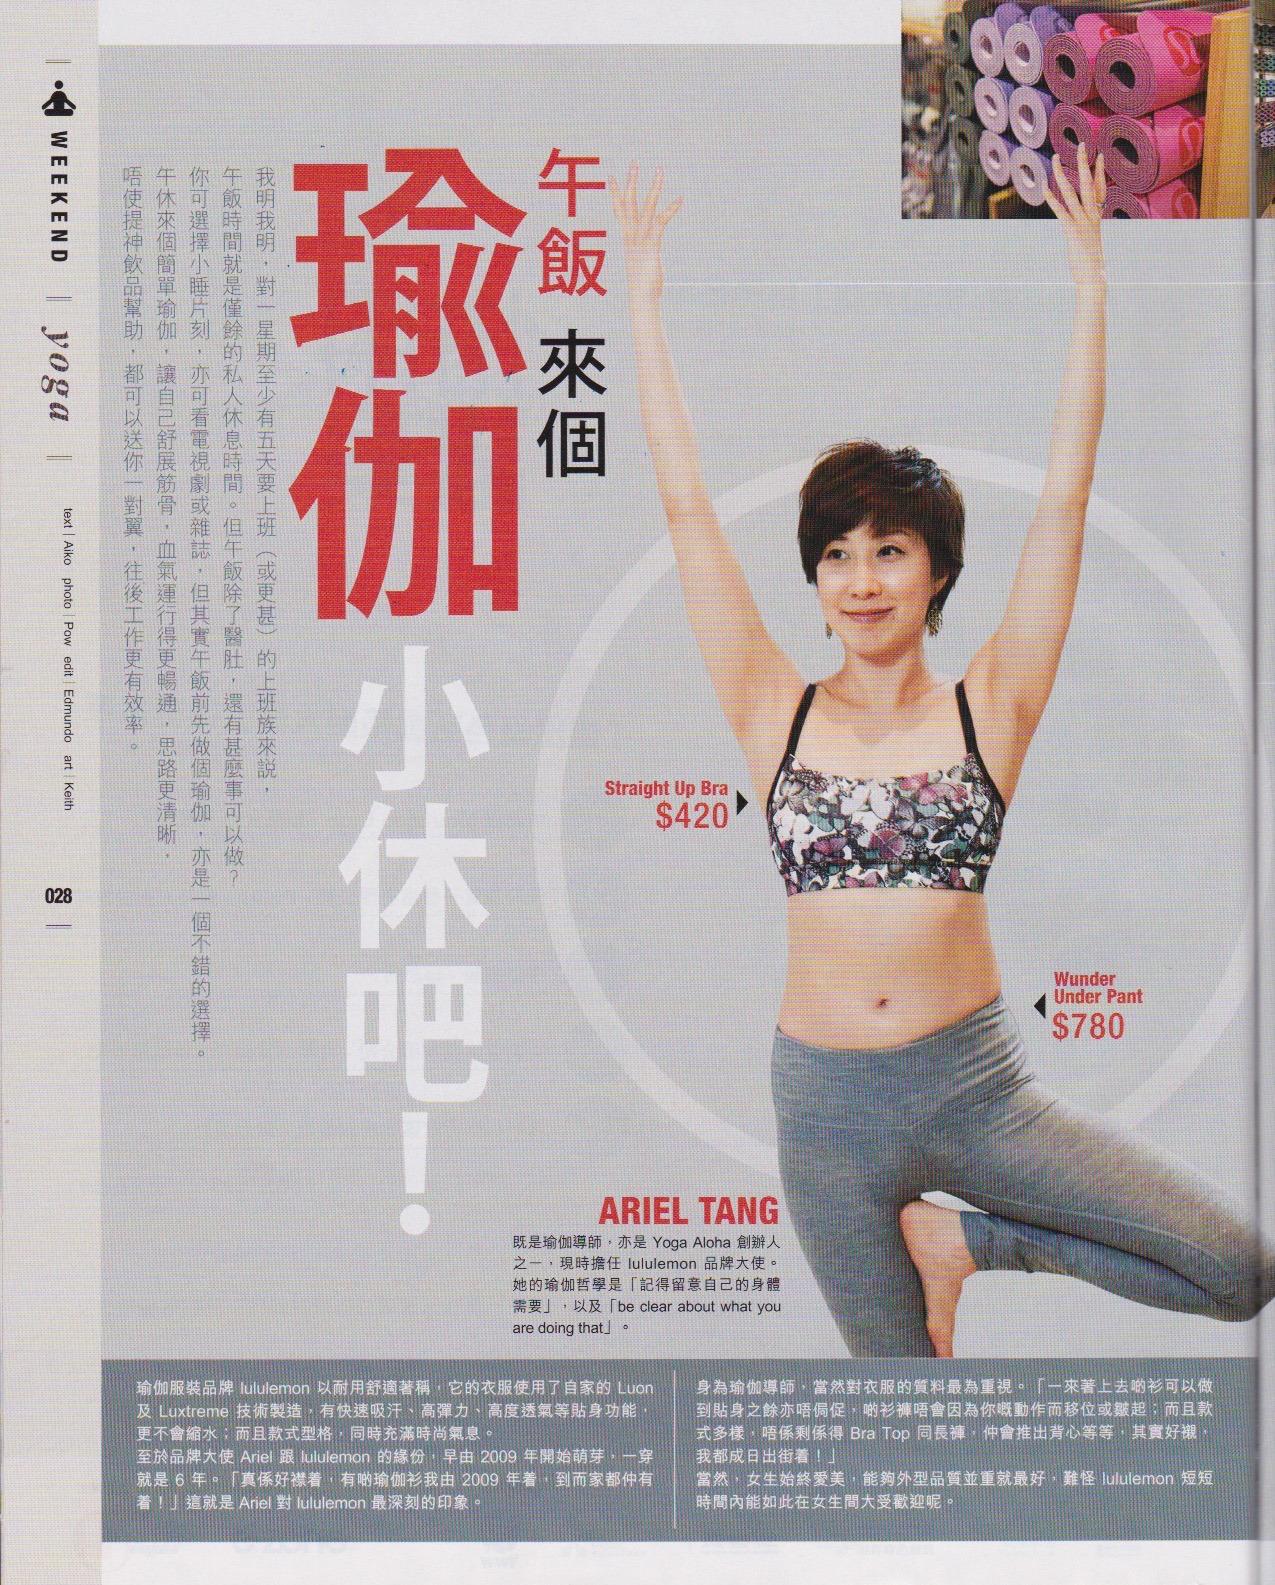 Lunch Yoga by Ariel Tang. U Magazine